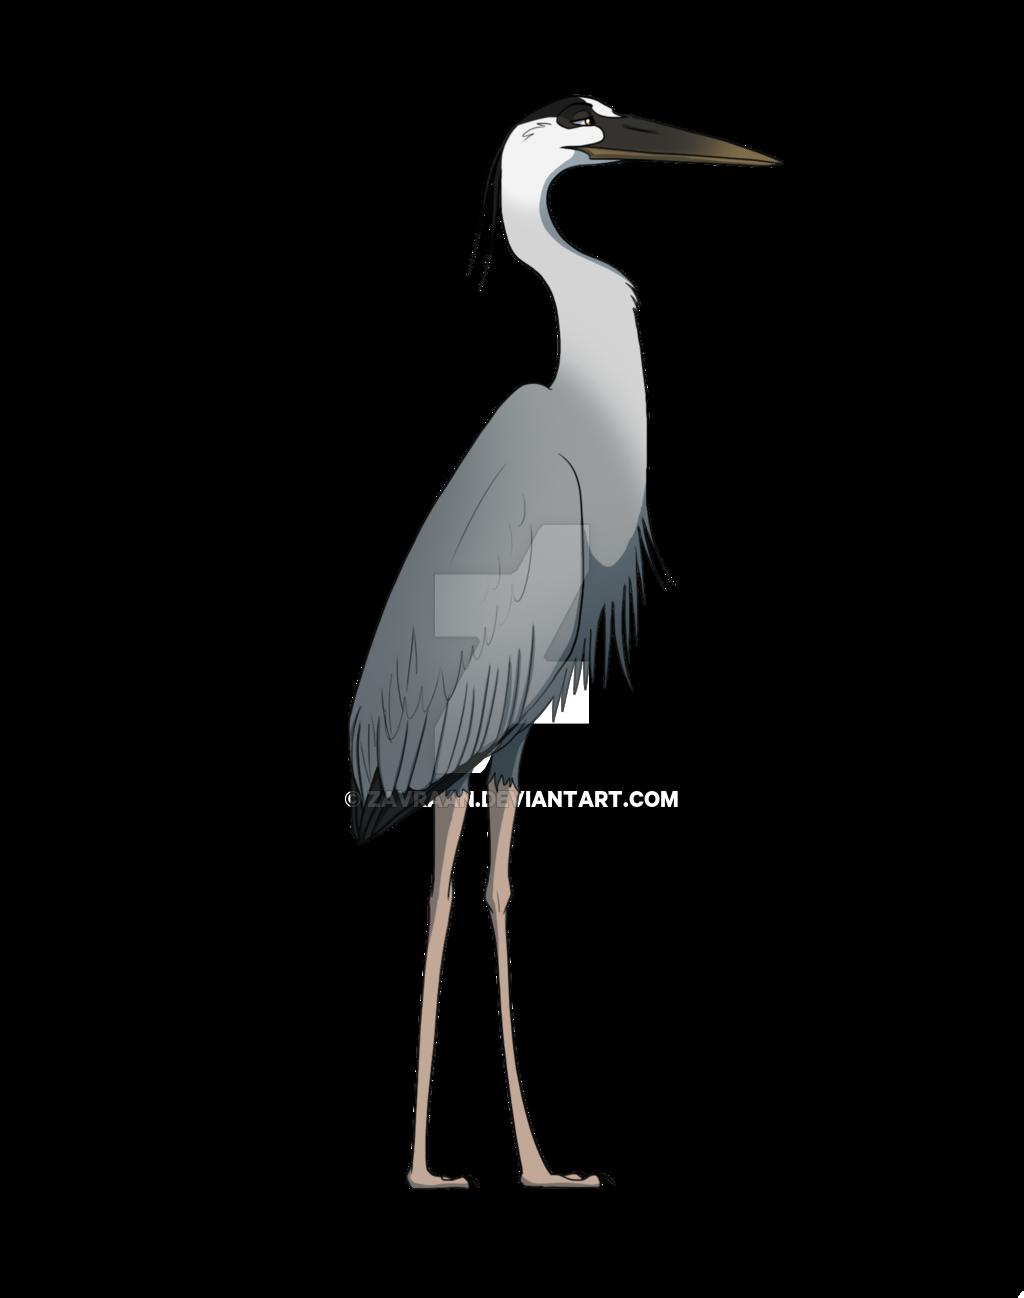 Png mart. Clipart birds blue heron